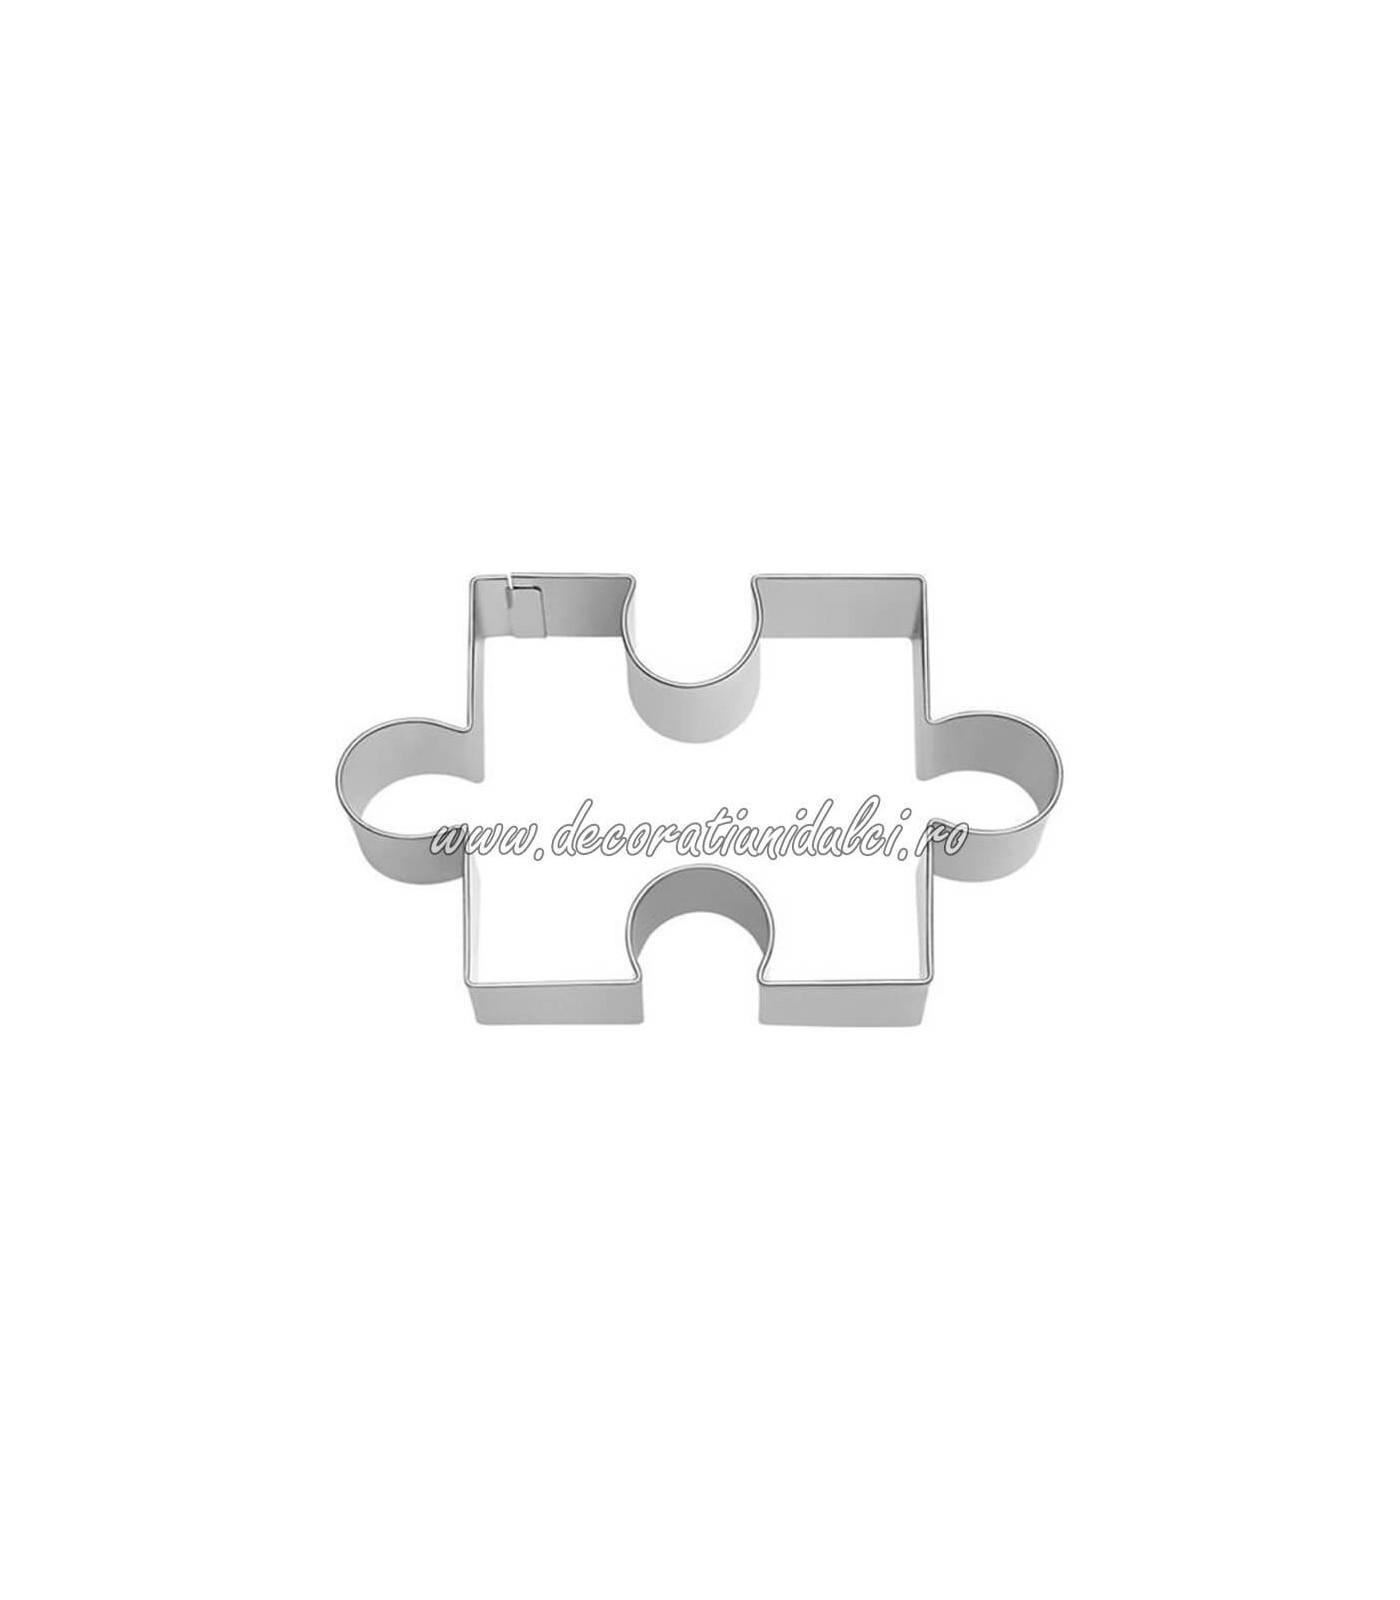 Decupator piesa puzzle